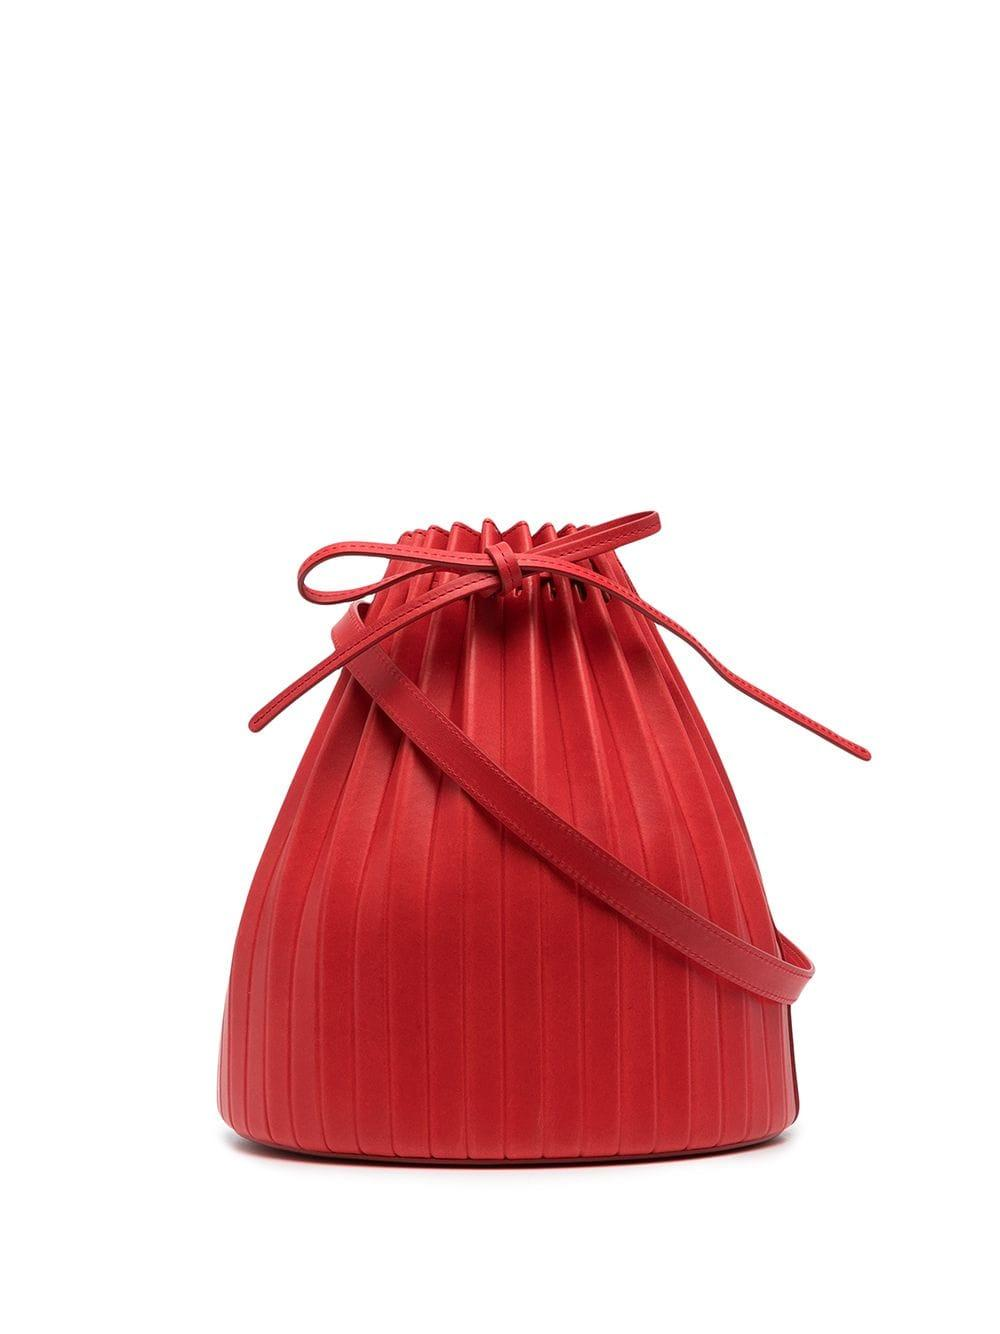 Pleated Bucket Bag Item # WR20H001KD